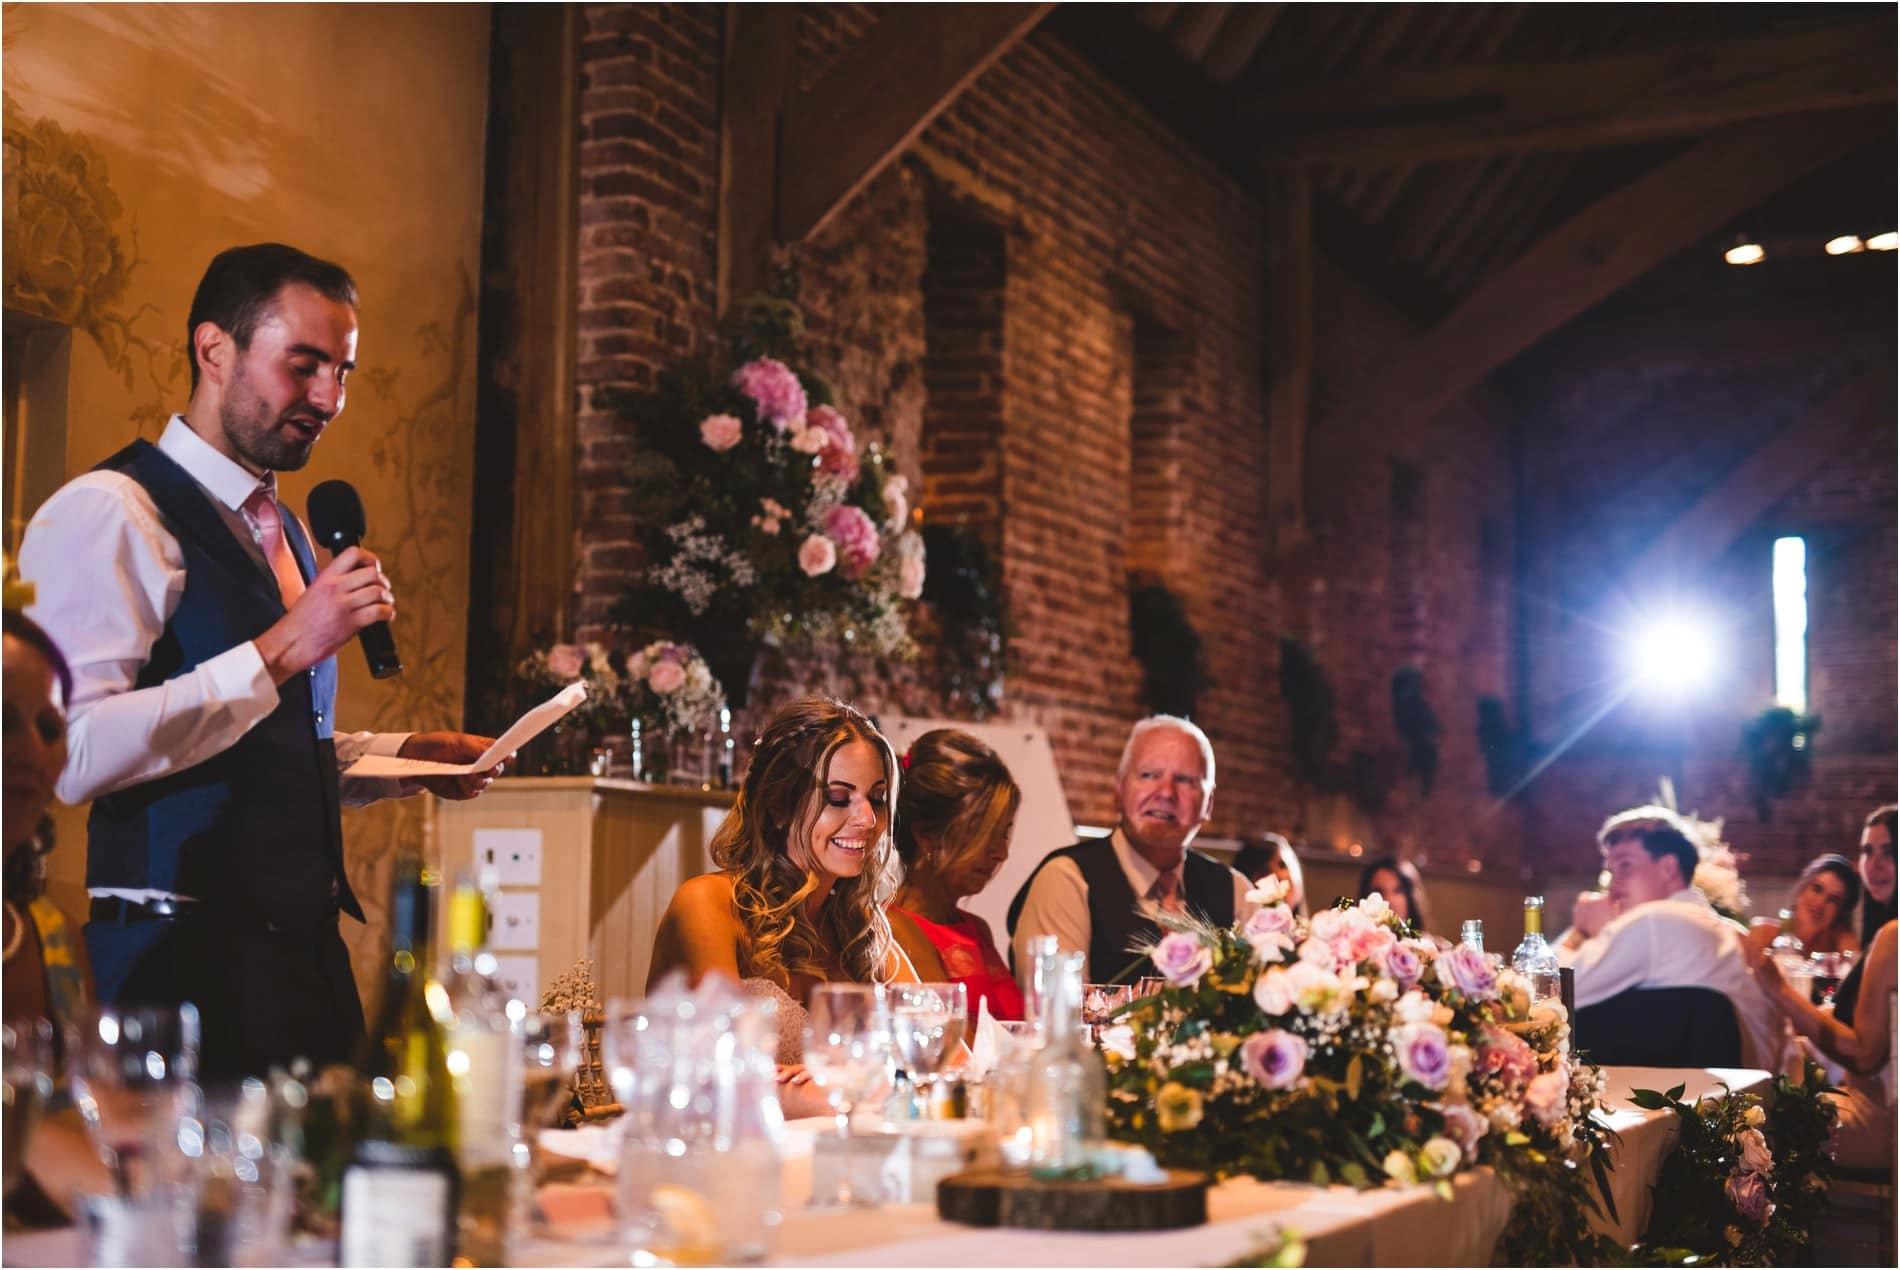 ELMS BARN WEDDING